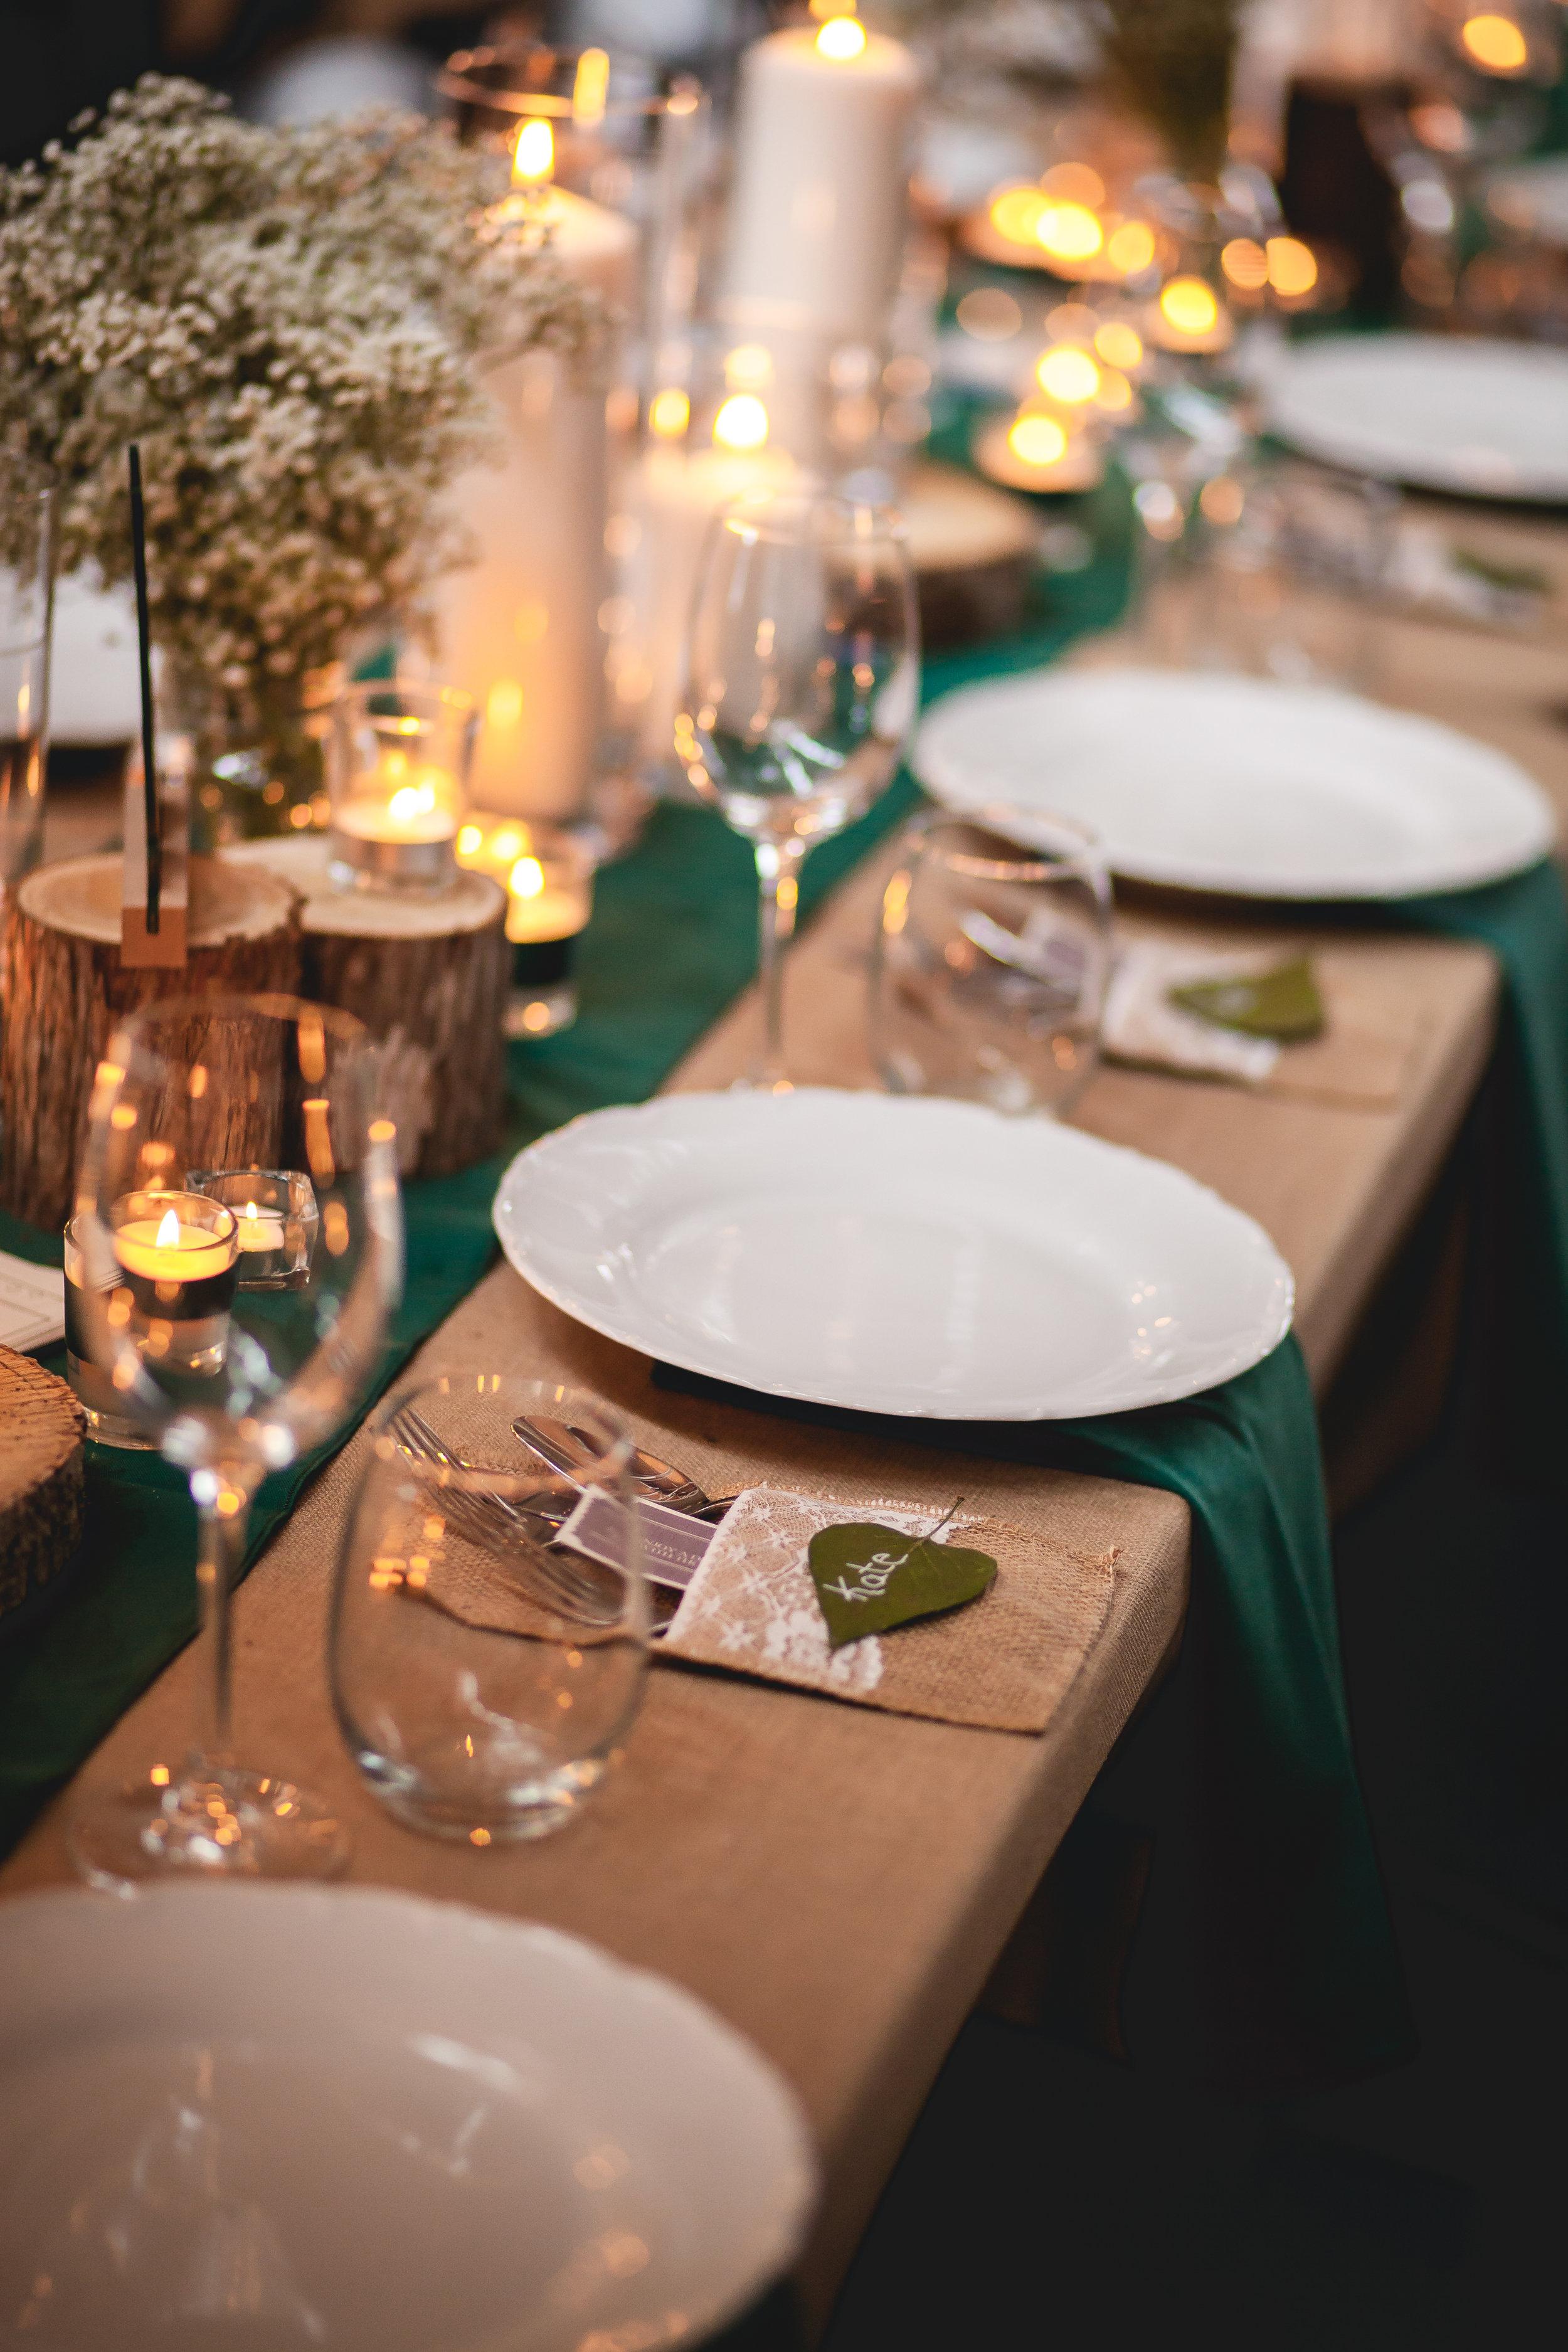 Amy D Photography- Winter Wedding- Tiffin Centre- Vintage Wedding Decor- Rustic Wedding- Wedding Decorations- Barrie Wedding Photography- Wedding Decor Ideas- Barrie Weddings (100 of 129).jpg